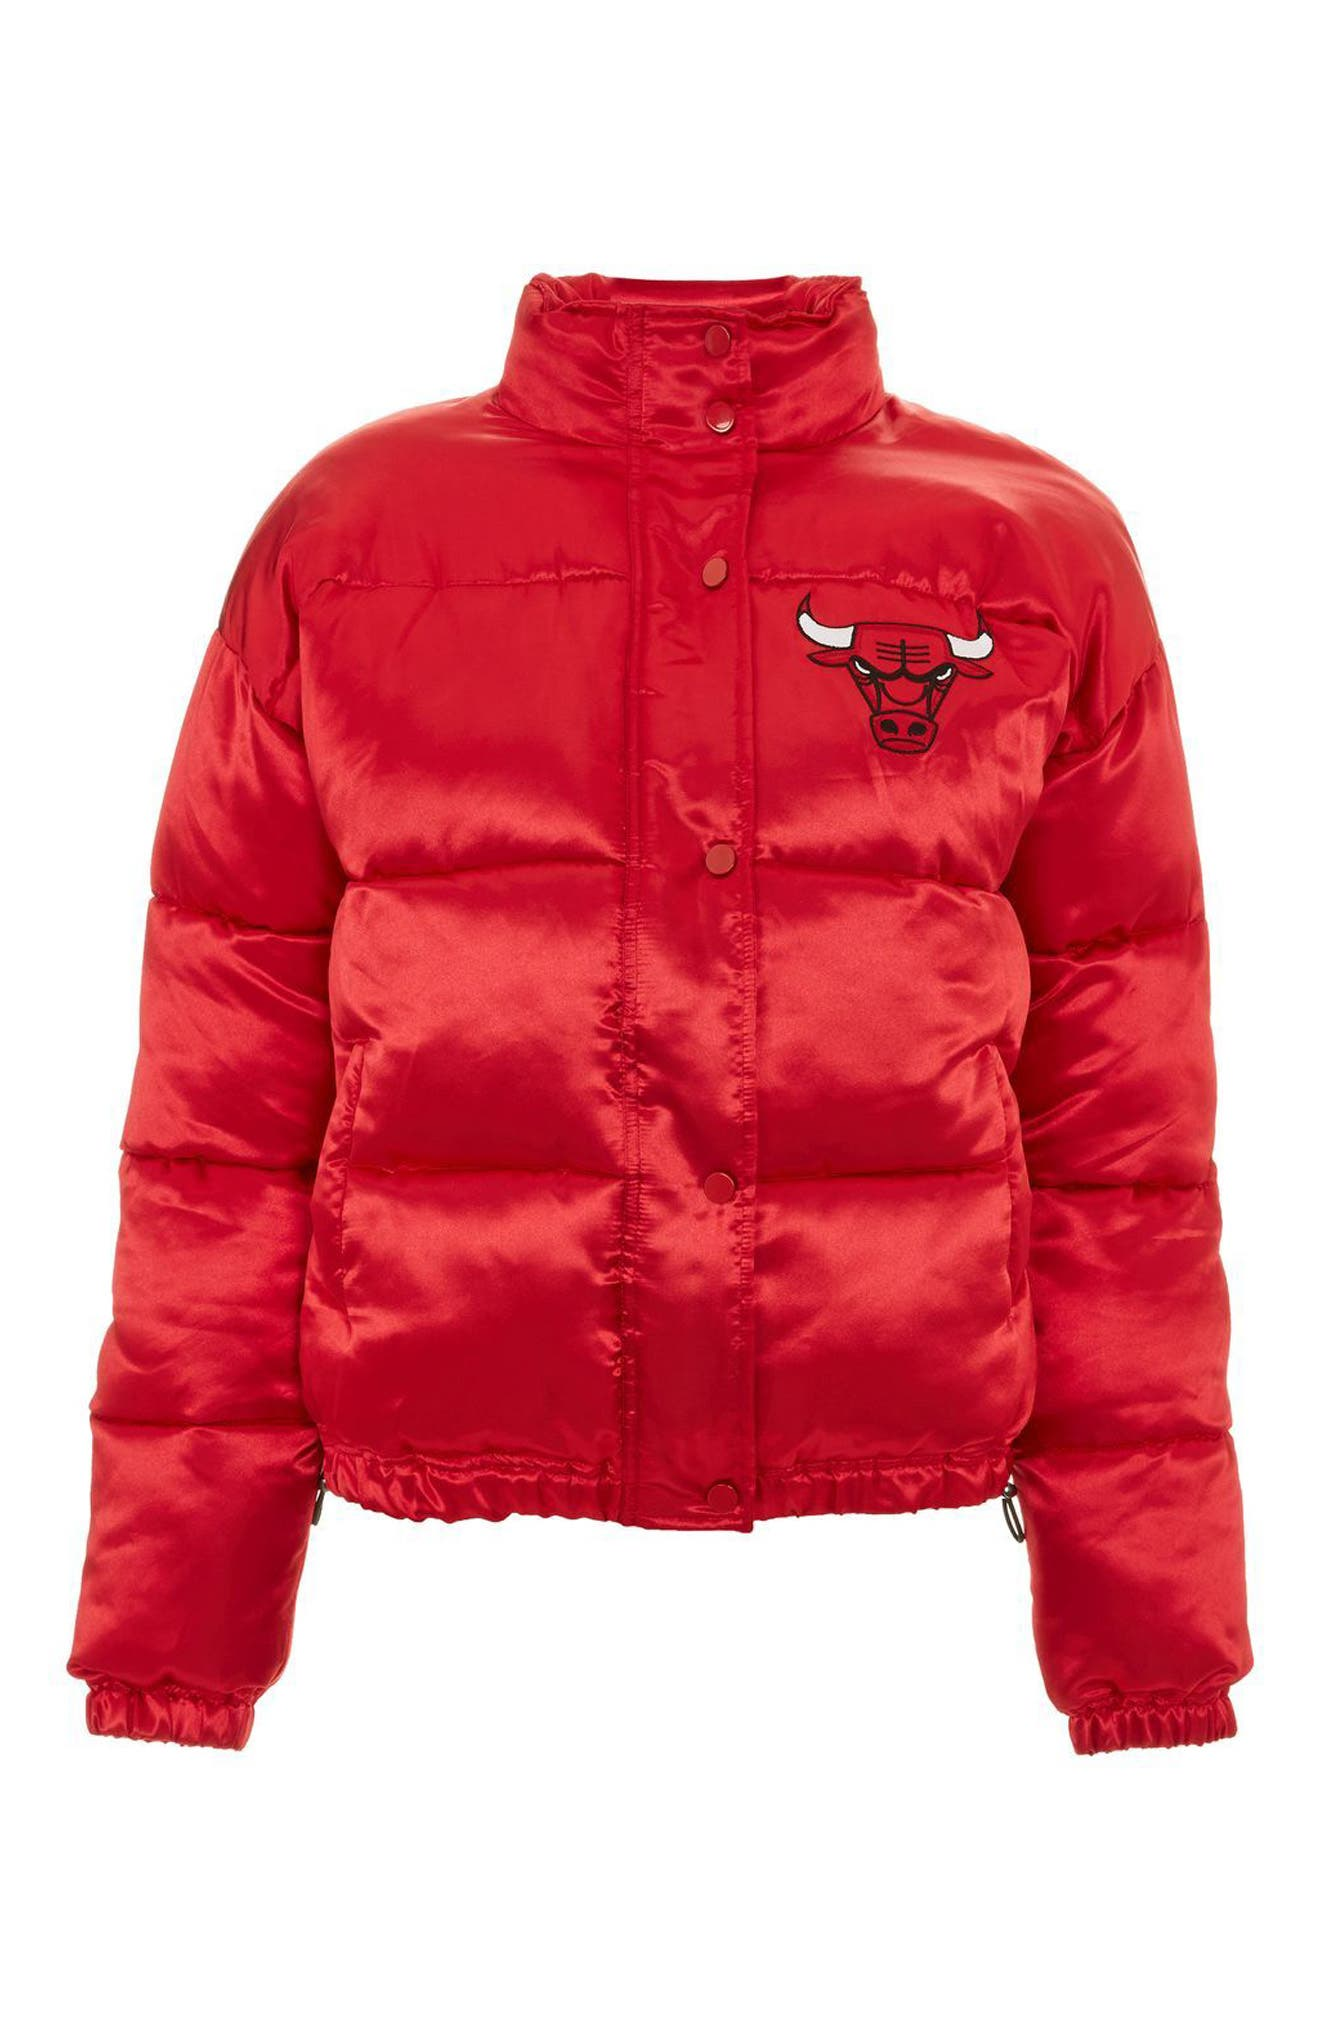 Topshop x UNK Chicago Bulls Puffer Jacket